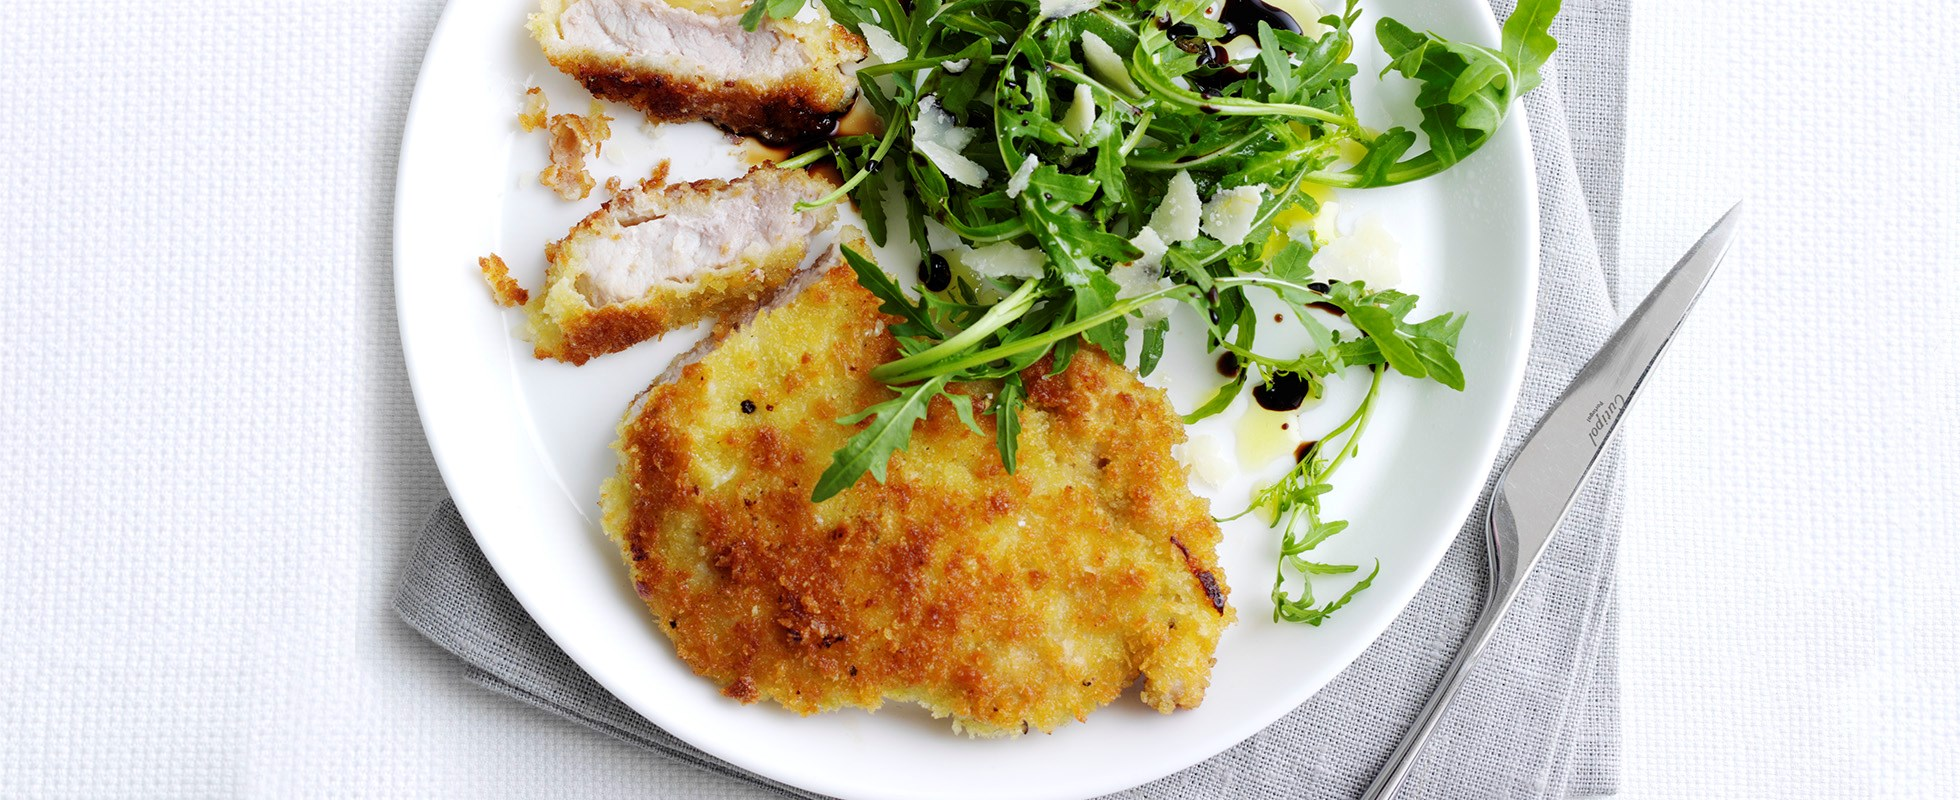 Parmesan-crusted pork